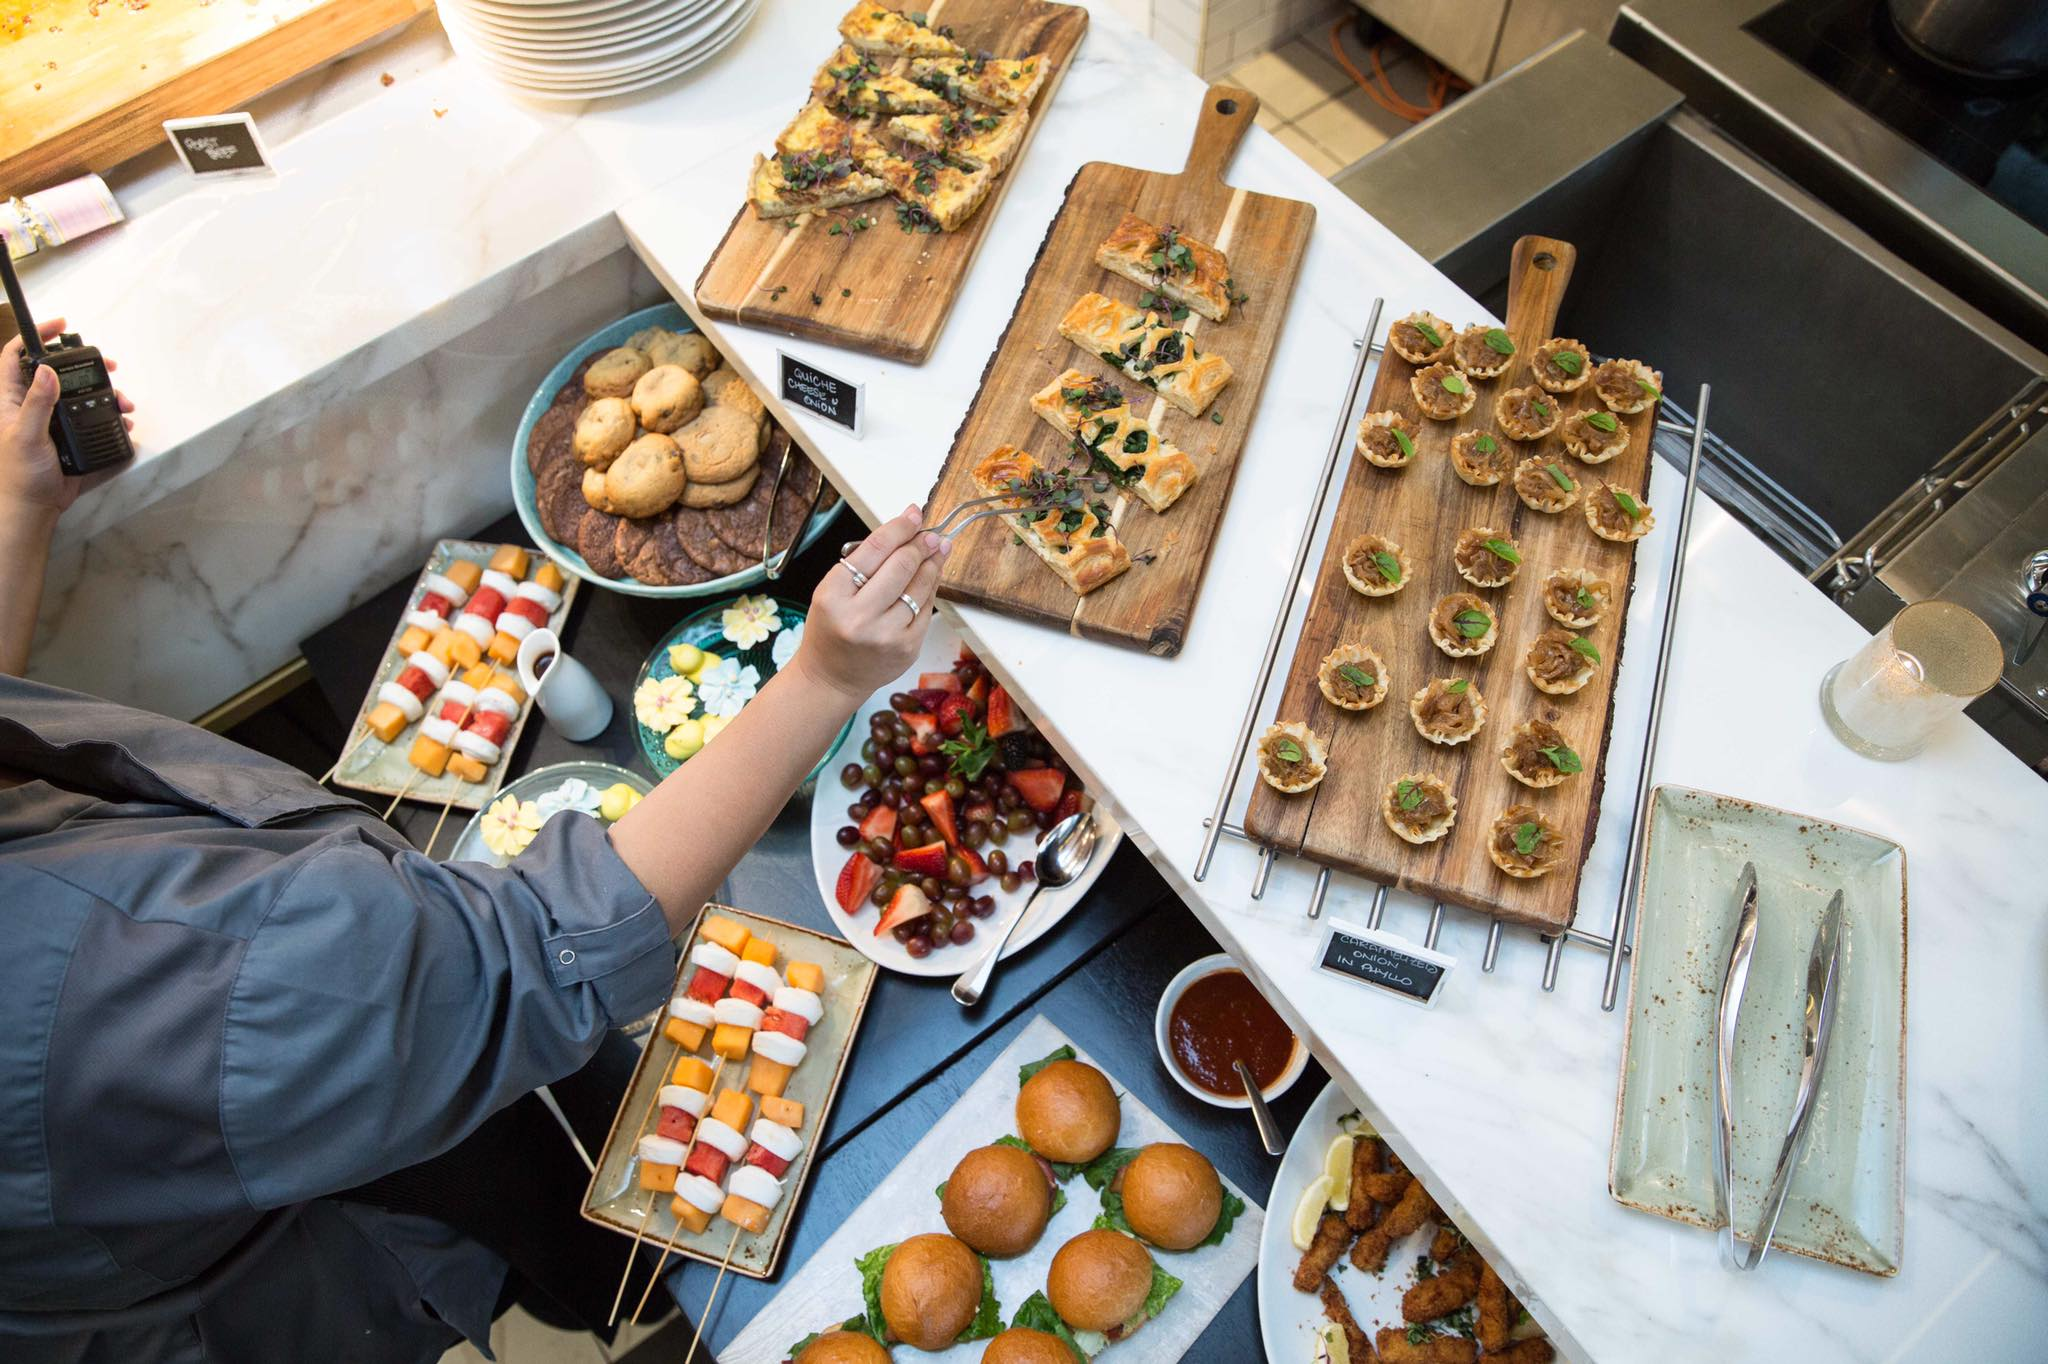 Phenomenal 16 Toronto Restaurants Serving All You Can Eat Brunch Download Free Architecture Designs Terchretrmadebymaigaardcom